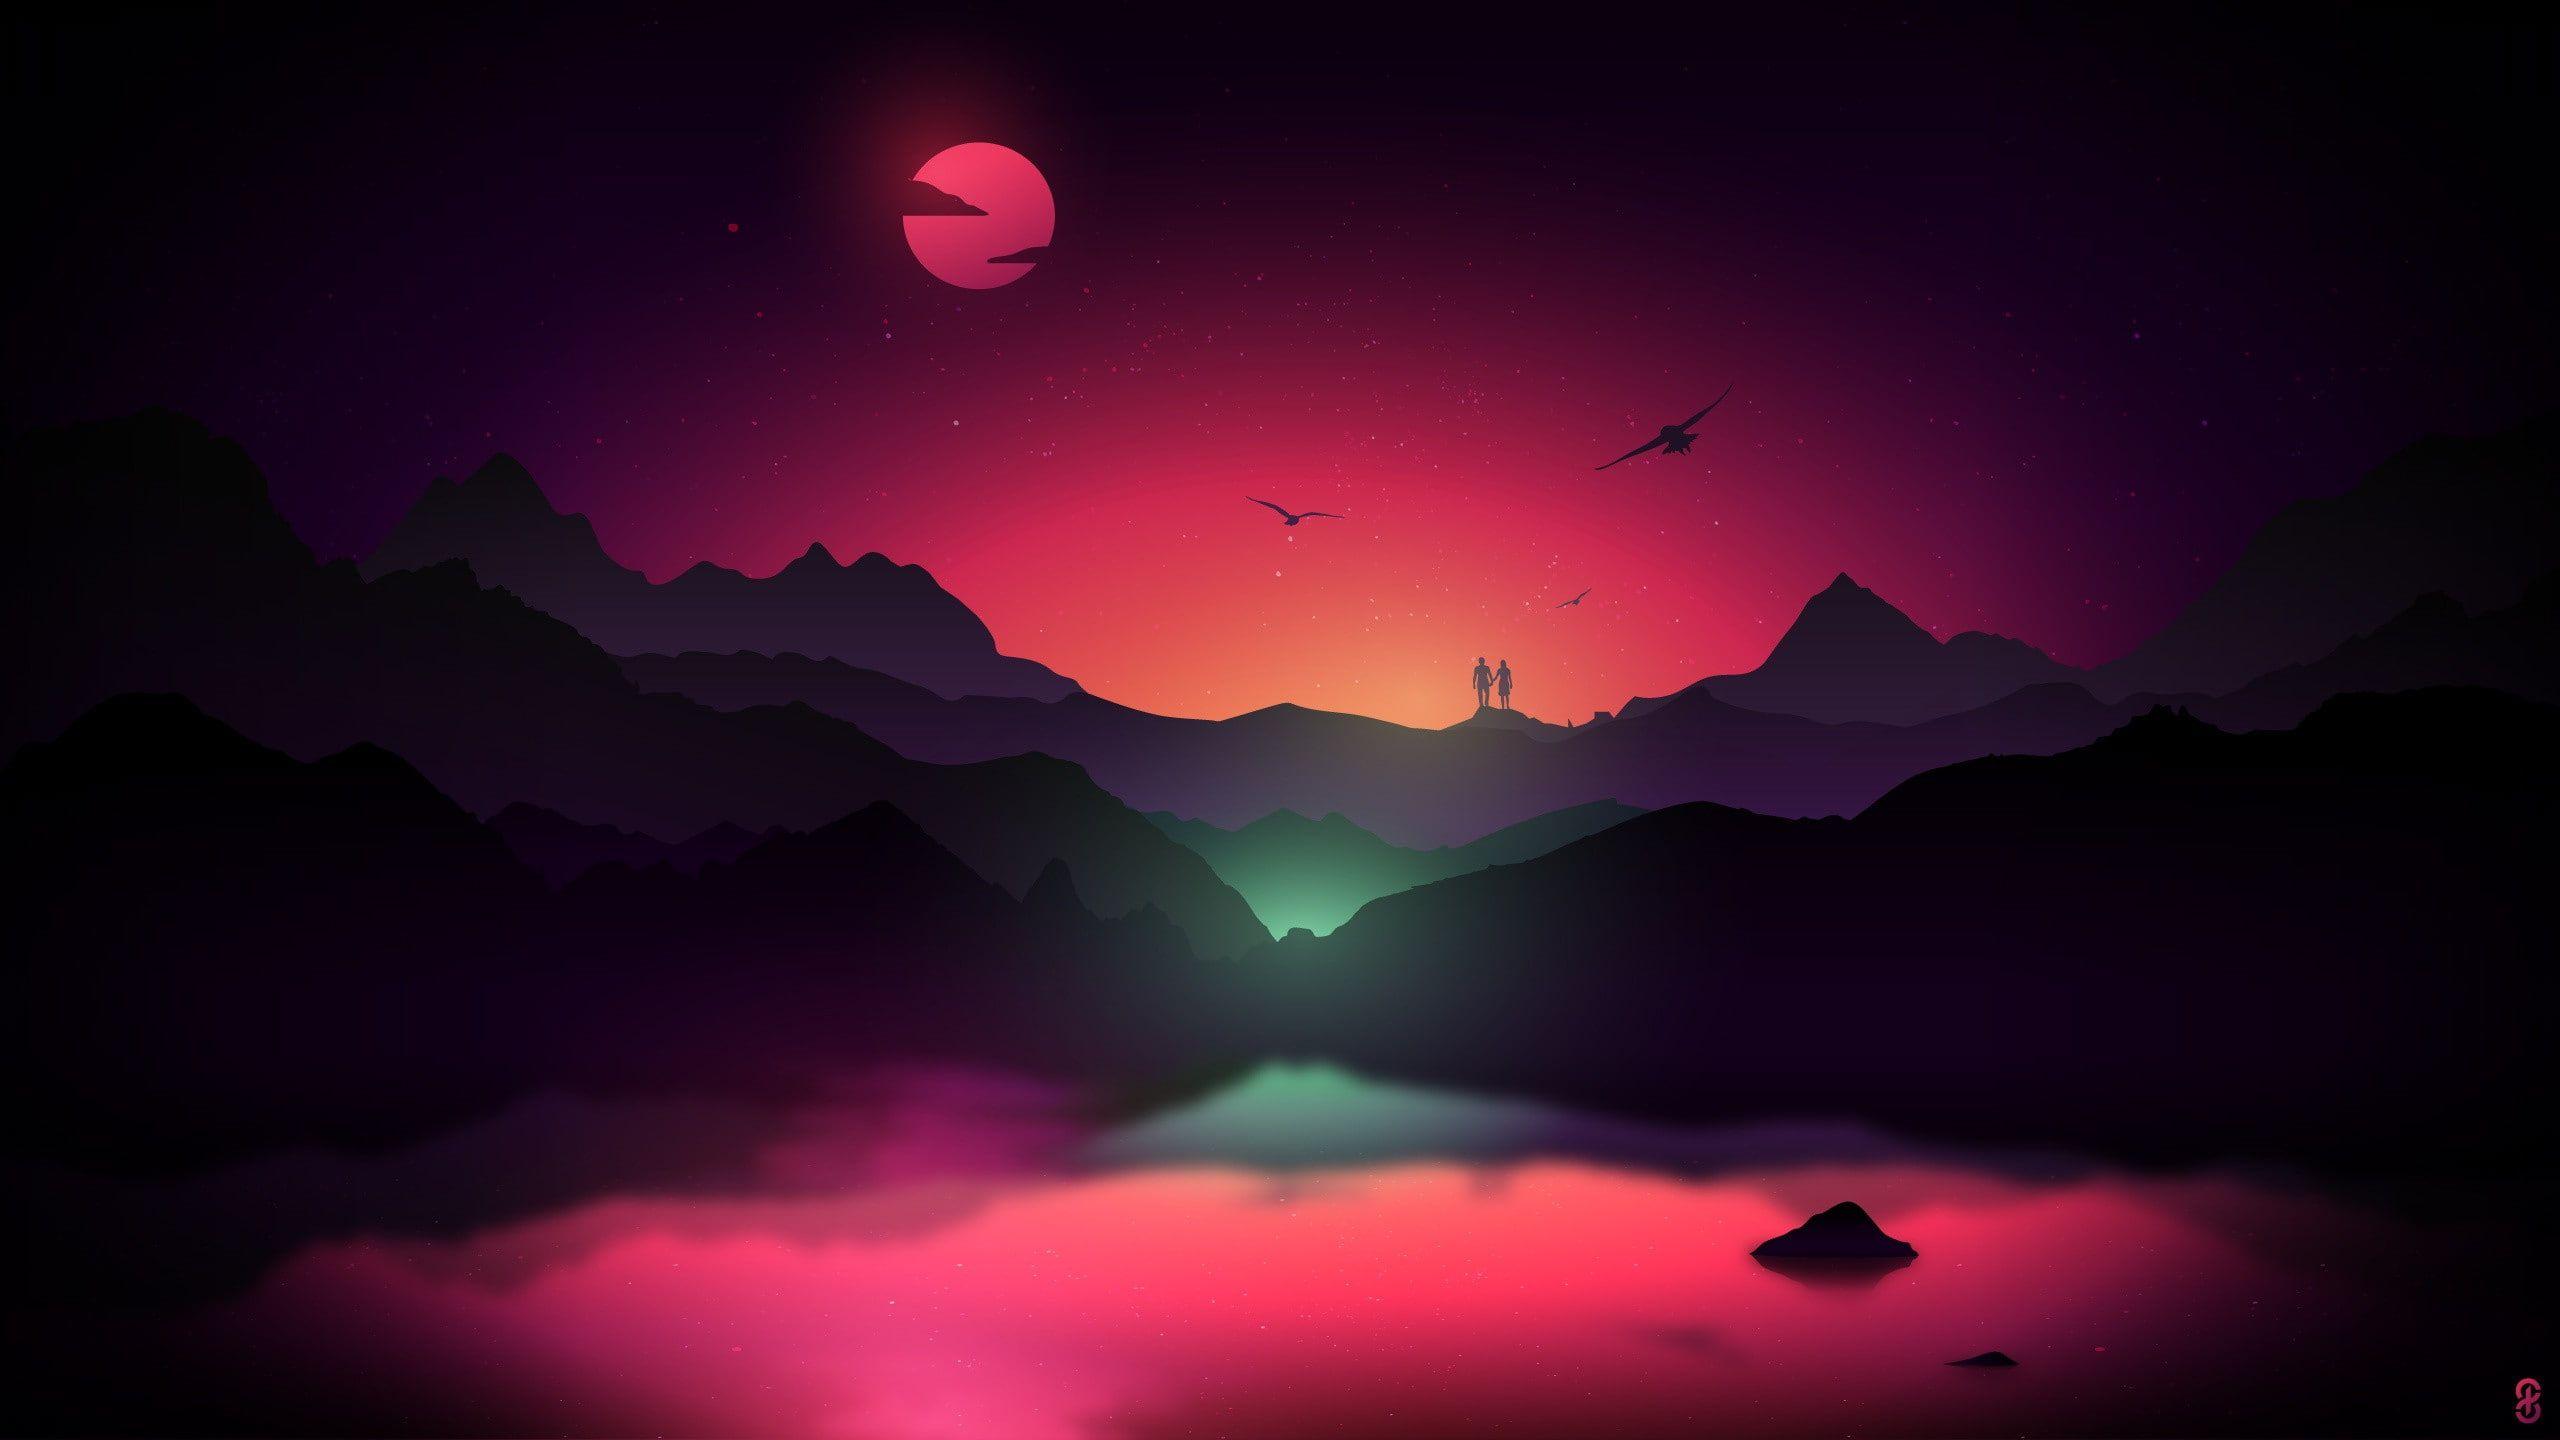 Romantic Couple 4k Pics Ultra Hd 2k Wallpaper Hdwallpaper Desktop In 2020 Landscape Wallpaper Scenic Landscape Landscape Illustration